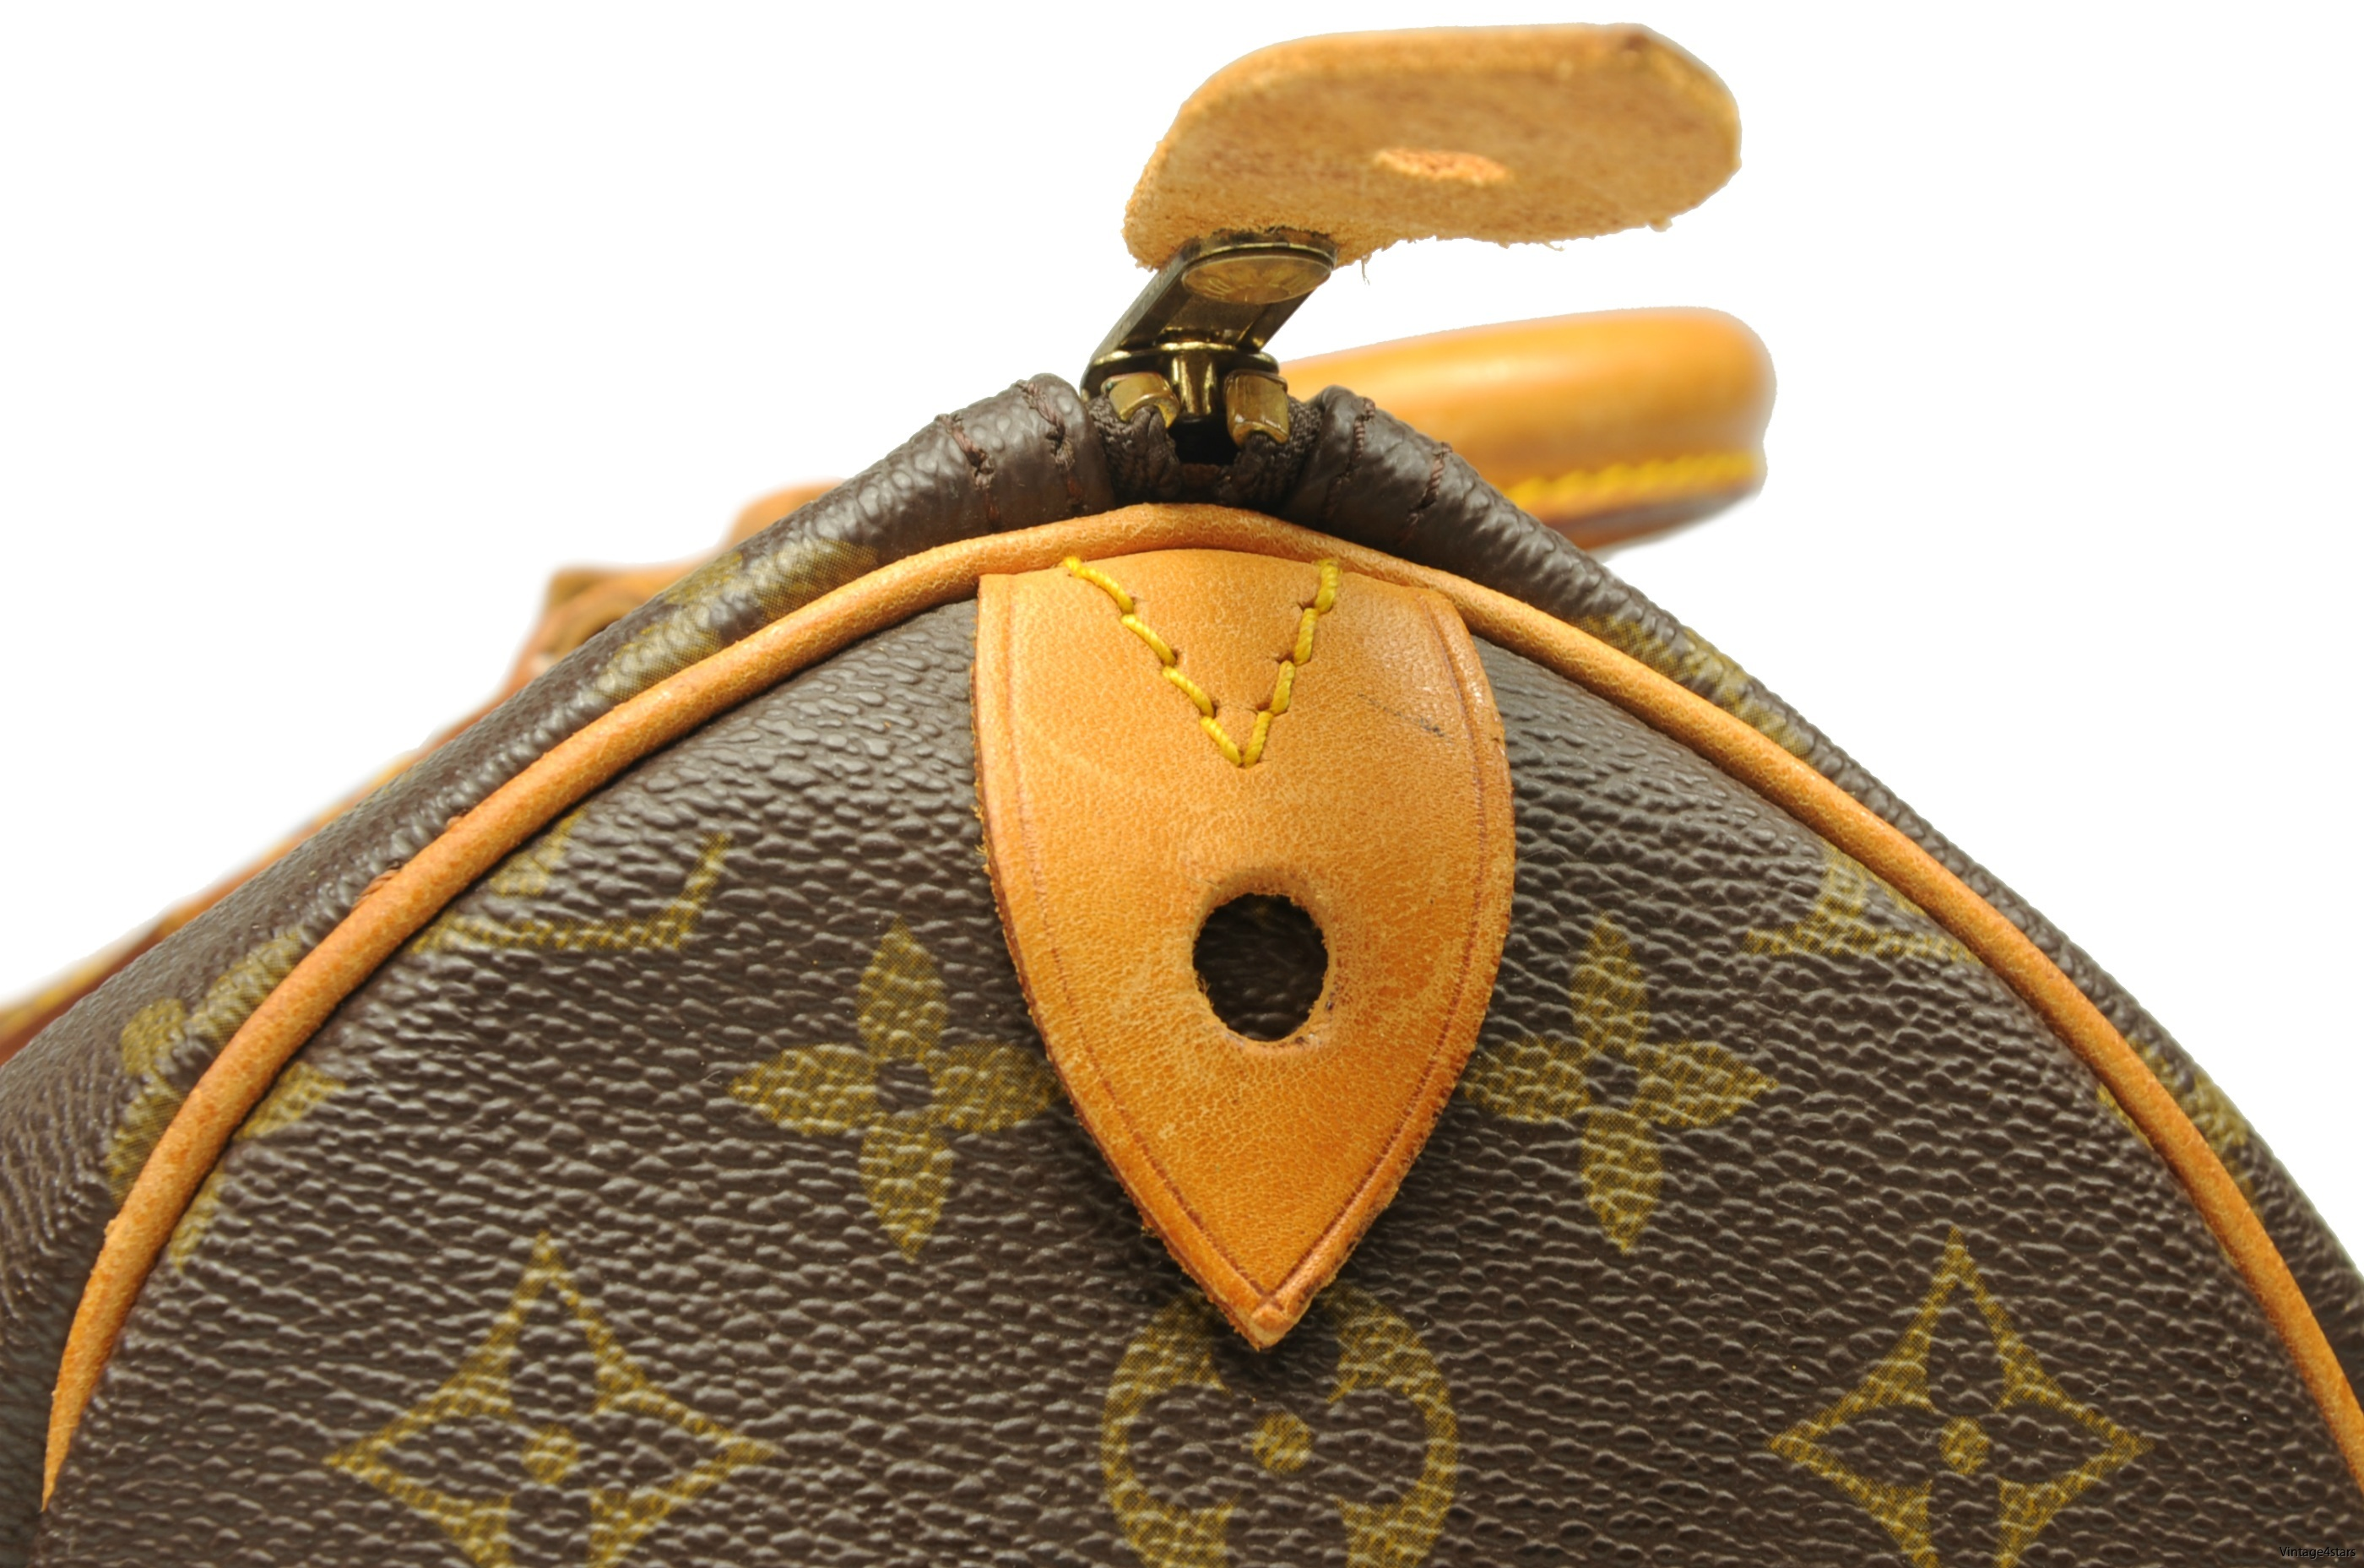 Louis Vuitton Speedy 35 Monogram 8